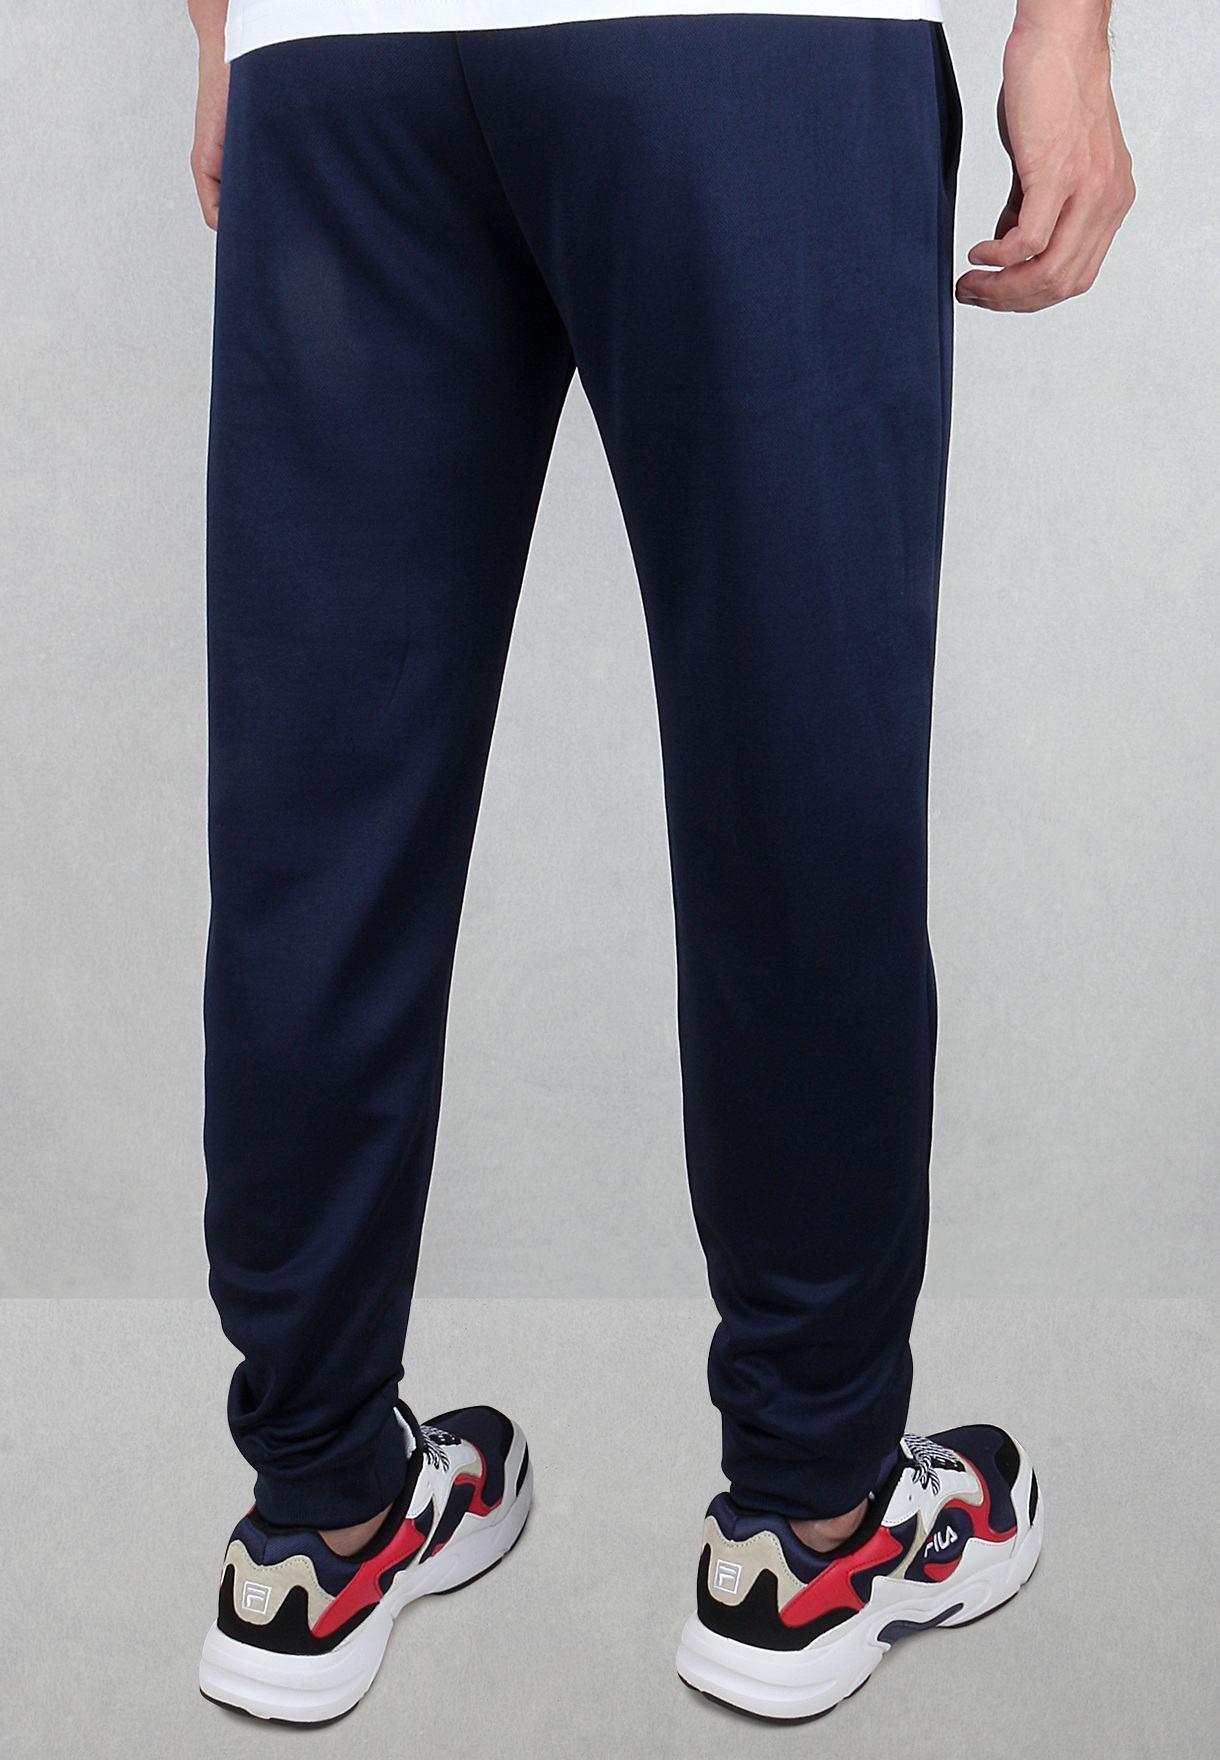 Vintage Nikko Cuffed Track Pants